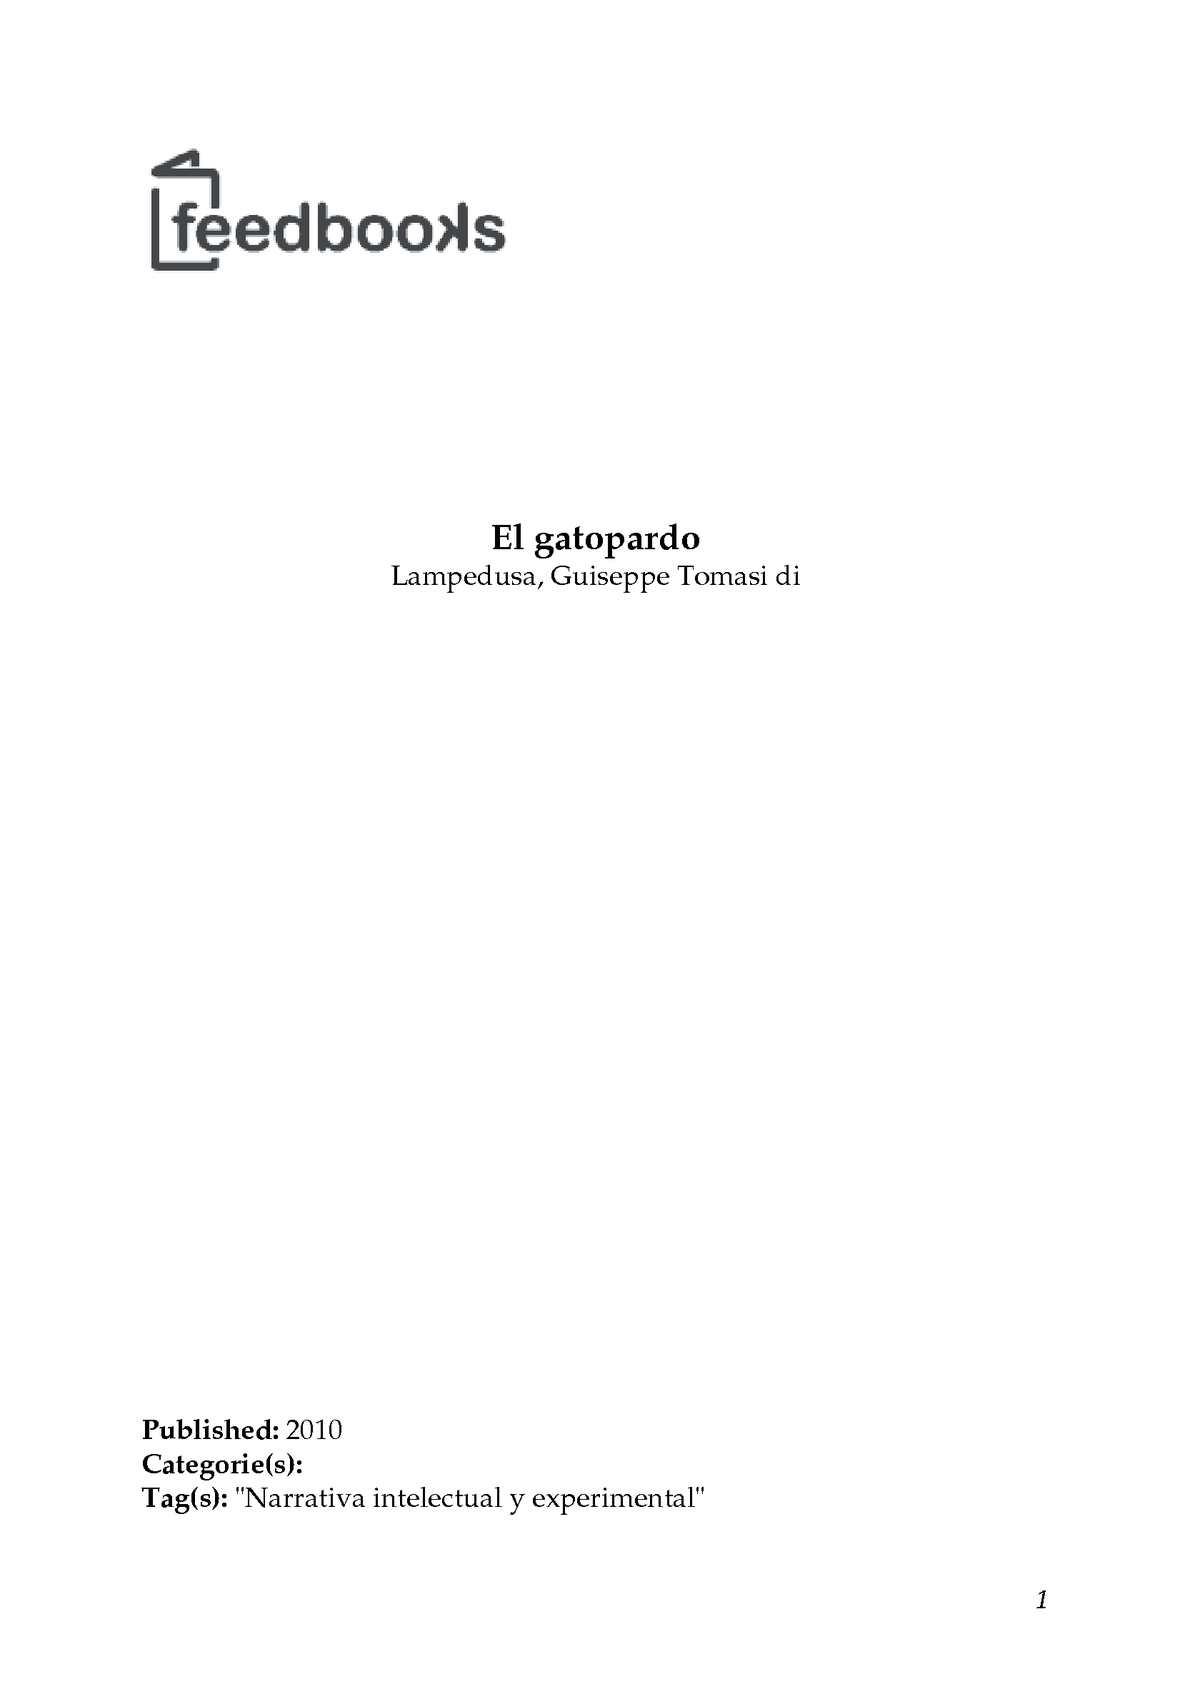 Calaméo - Lampedusa, Guiseppe Tomasi di - El gatopardo